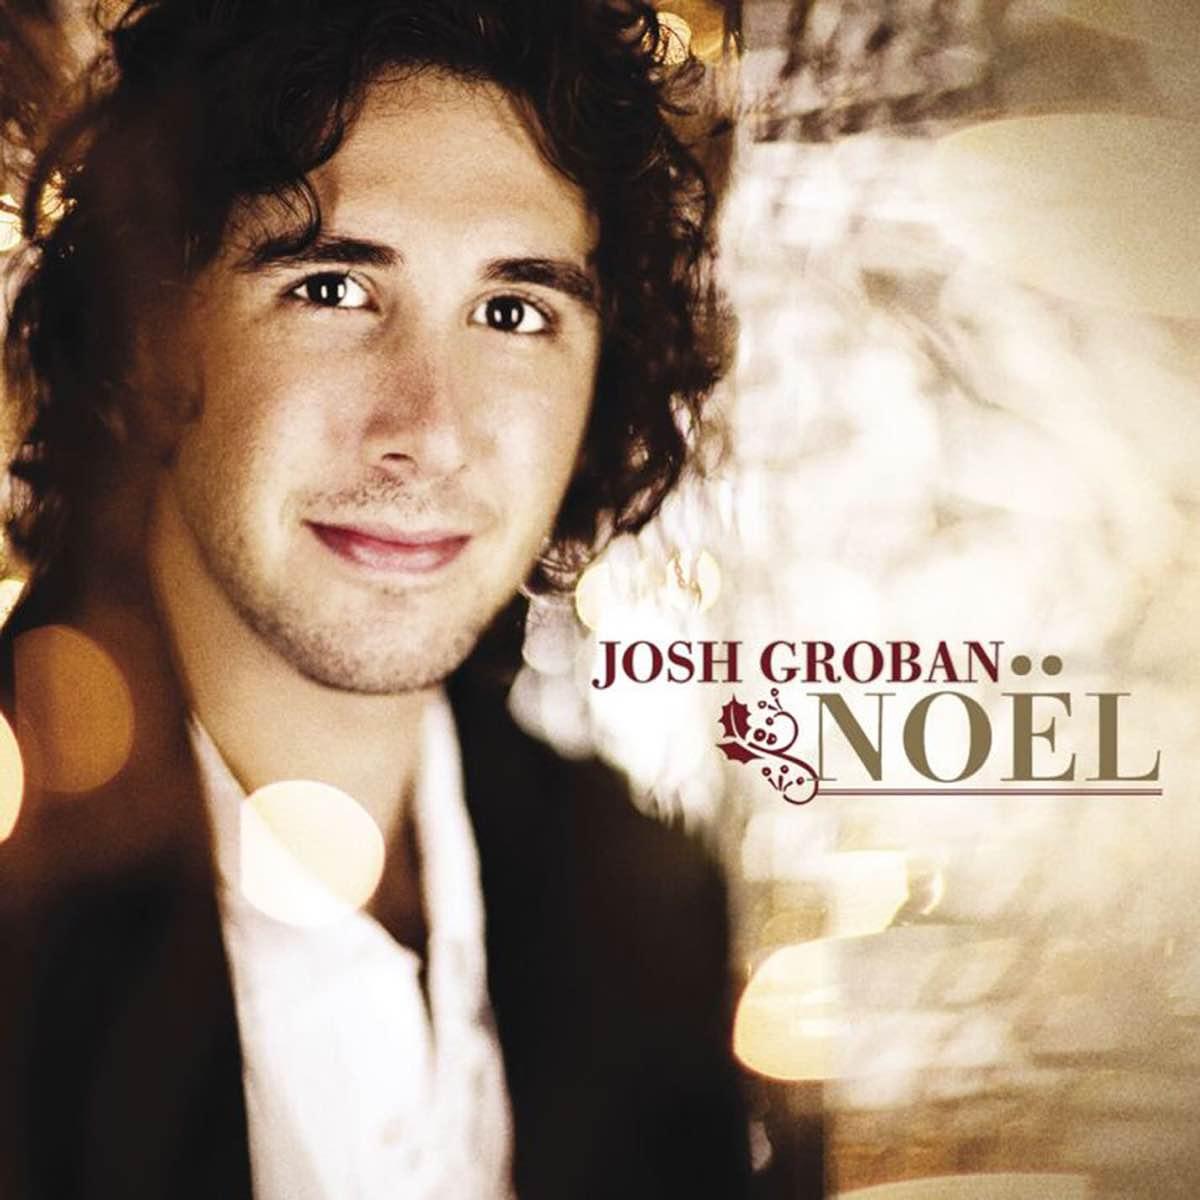 josh-groban-noel